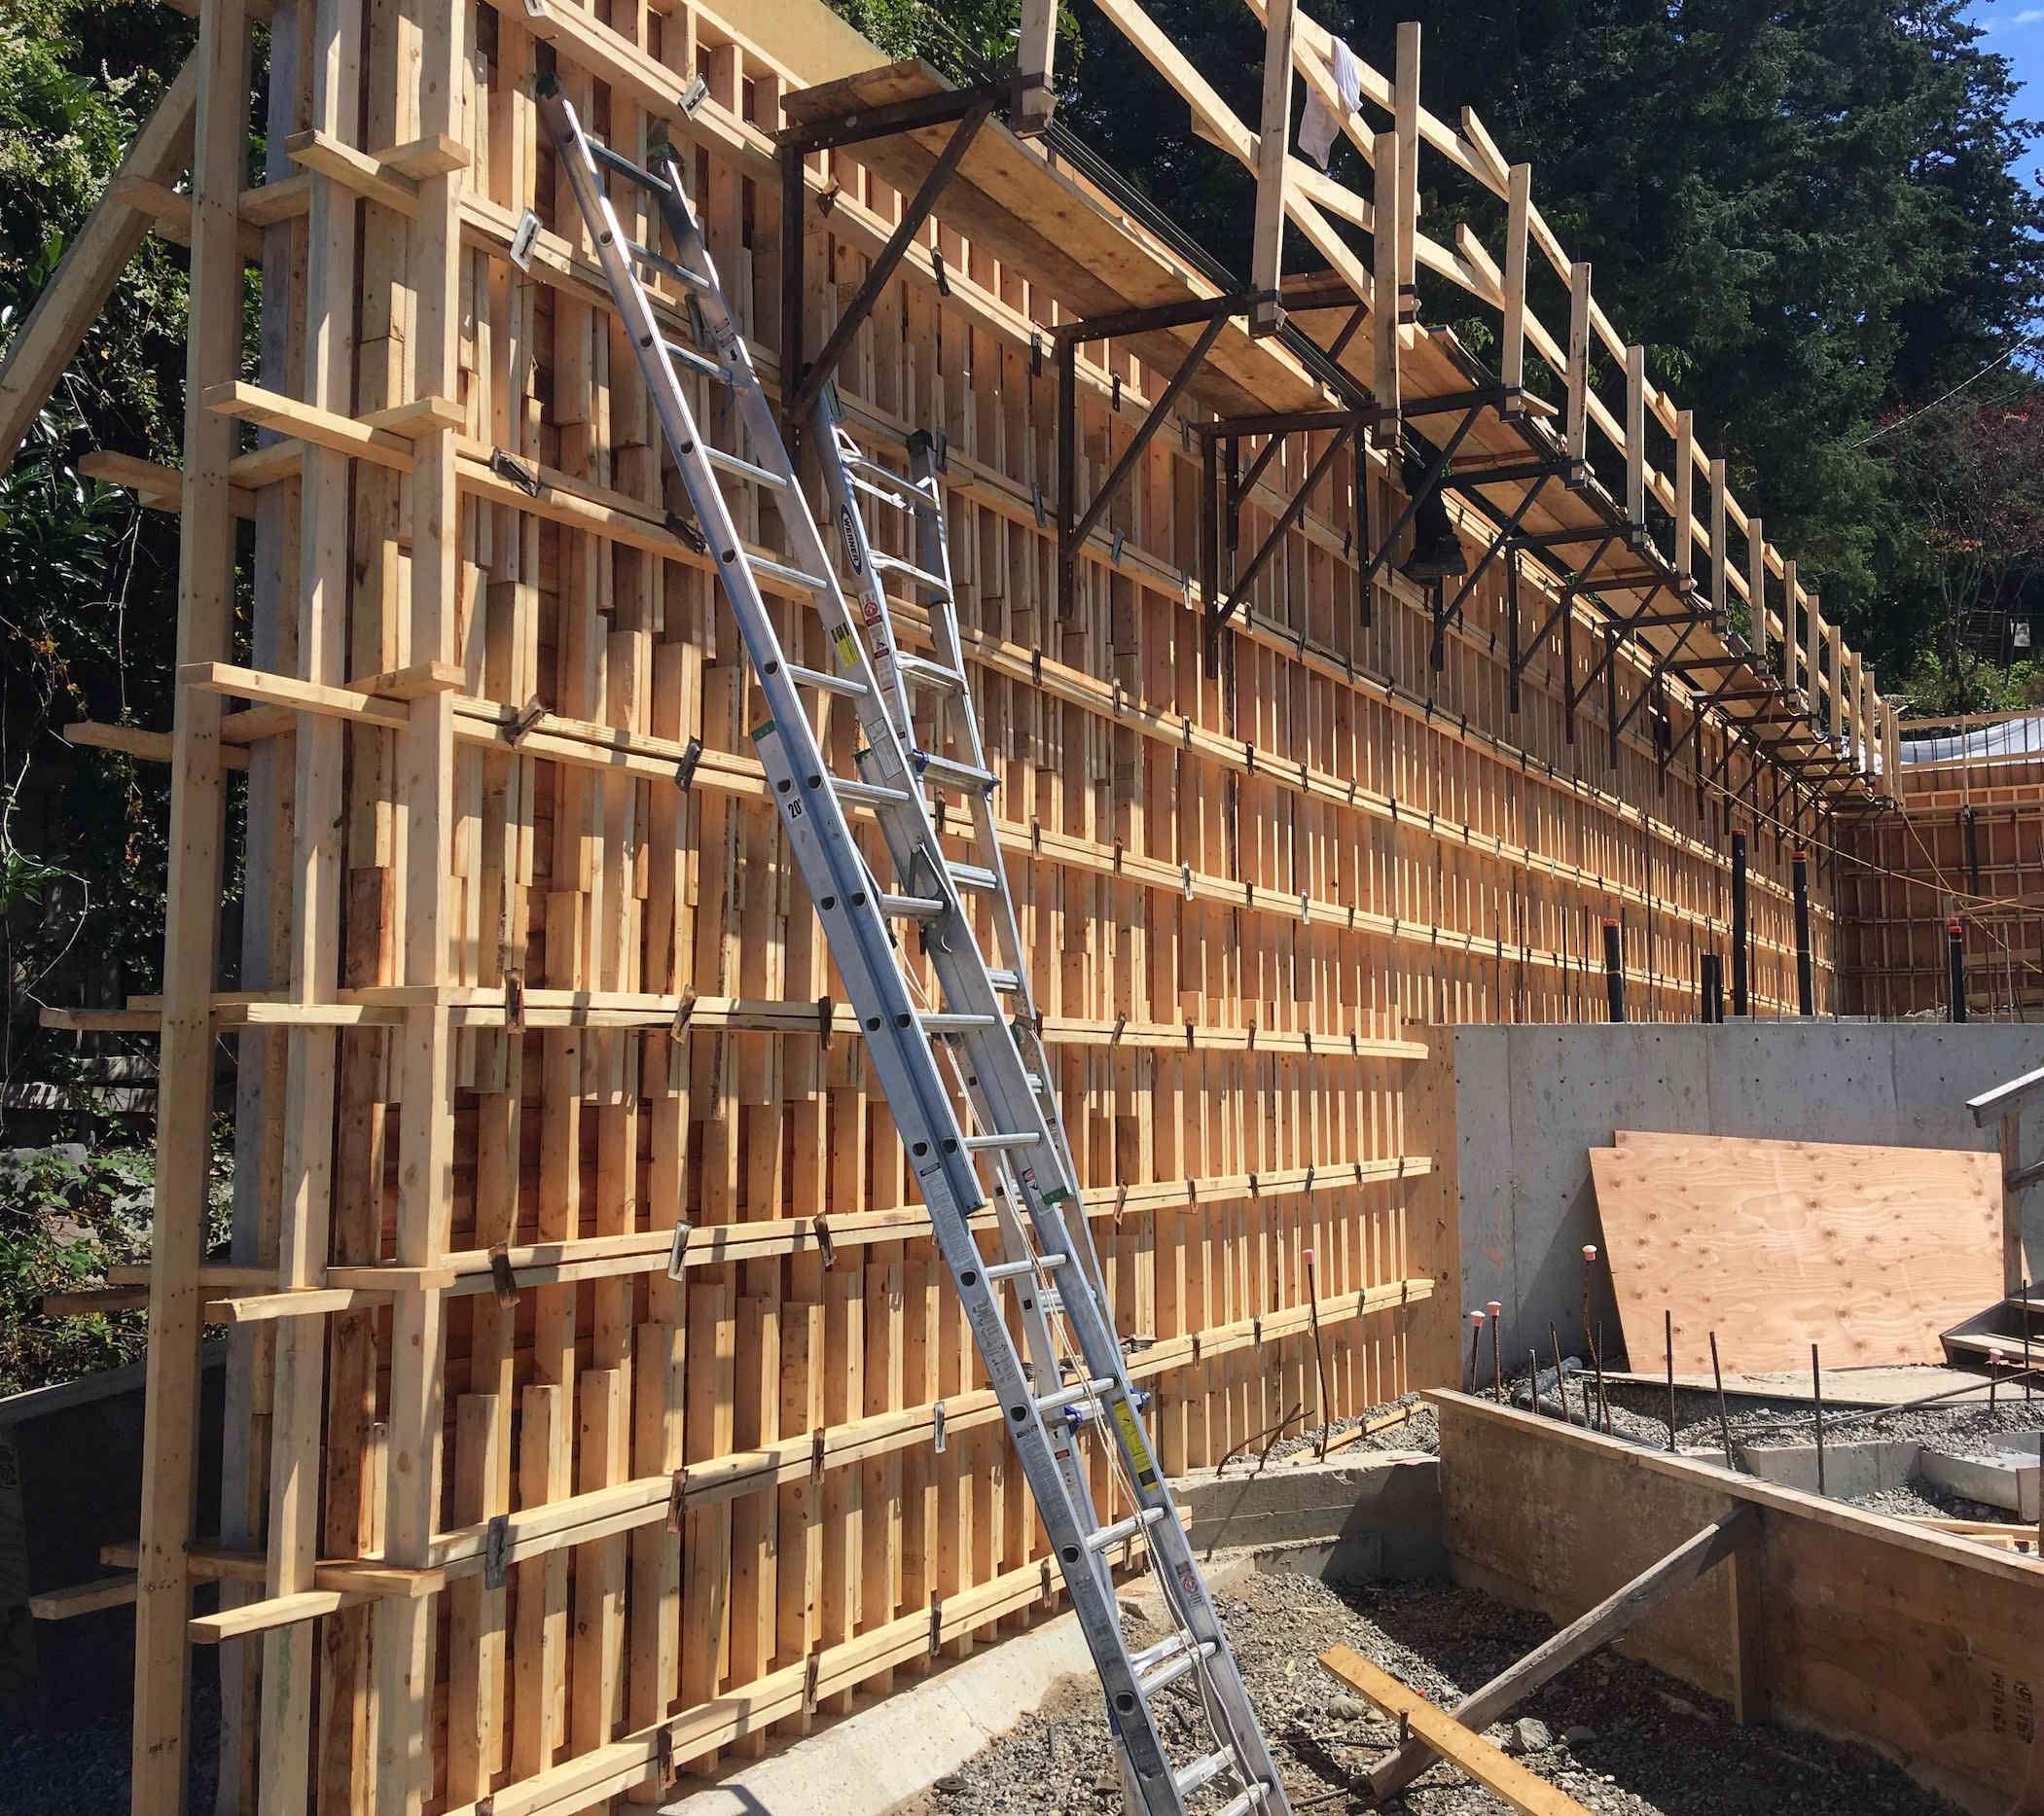 Postle_Construction_ConcreteForming19.jpg